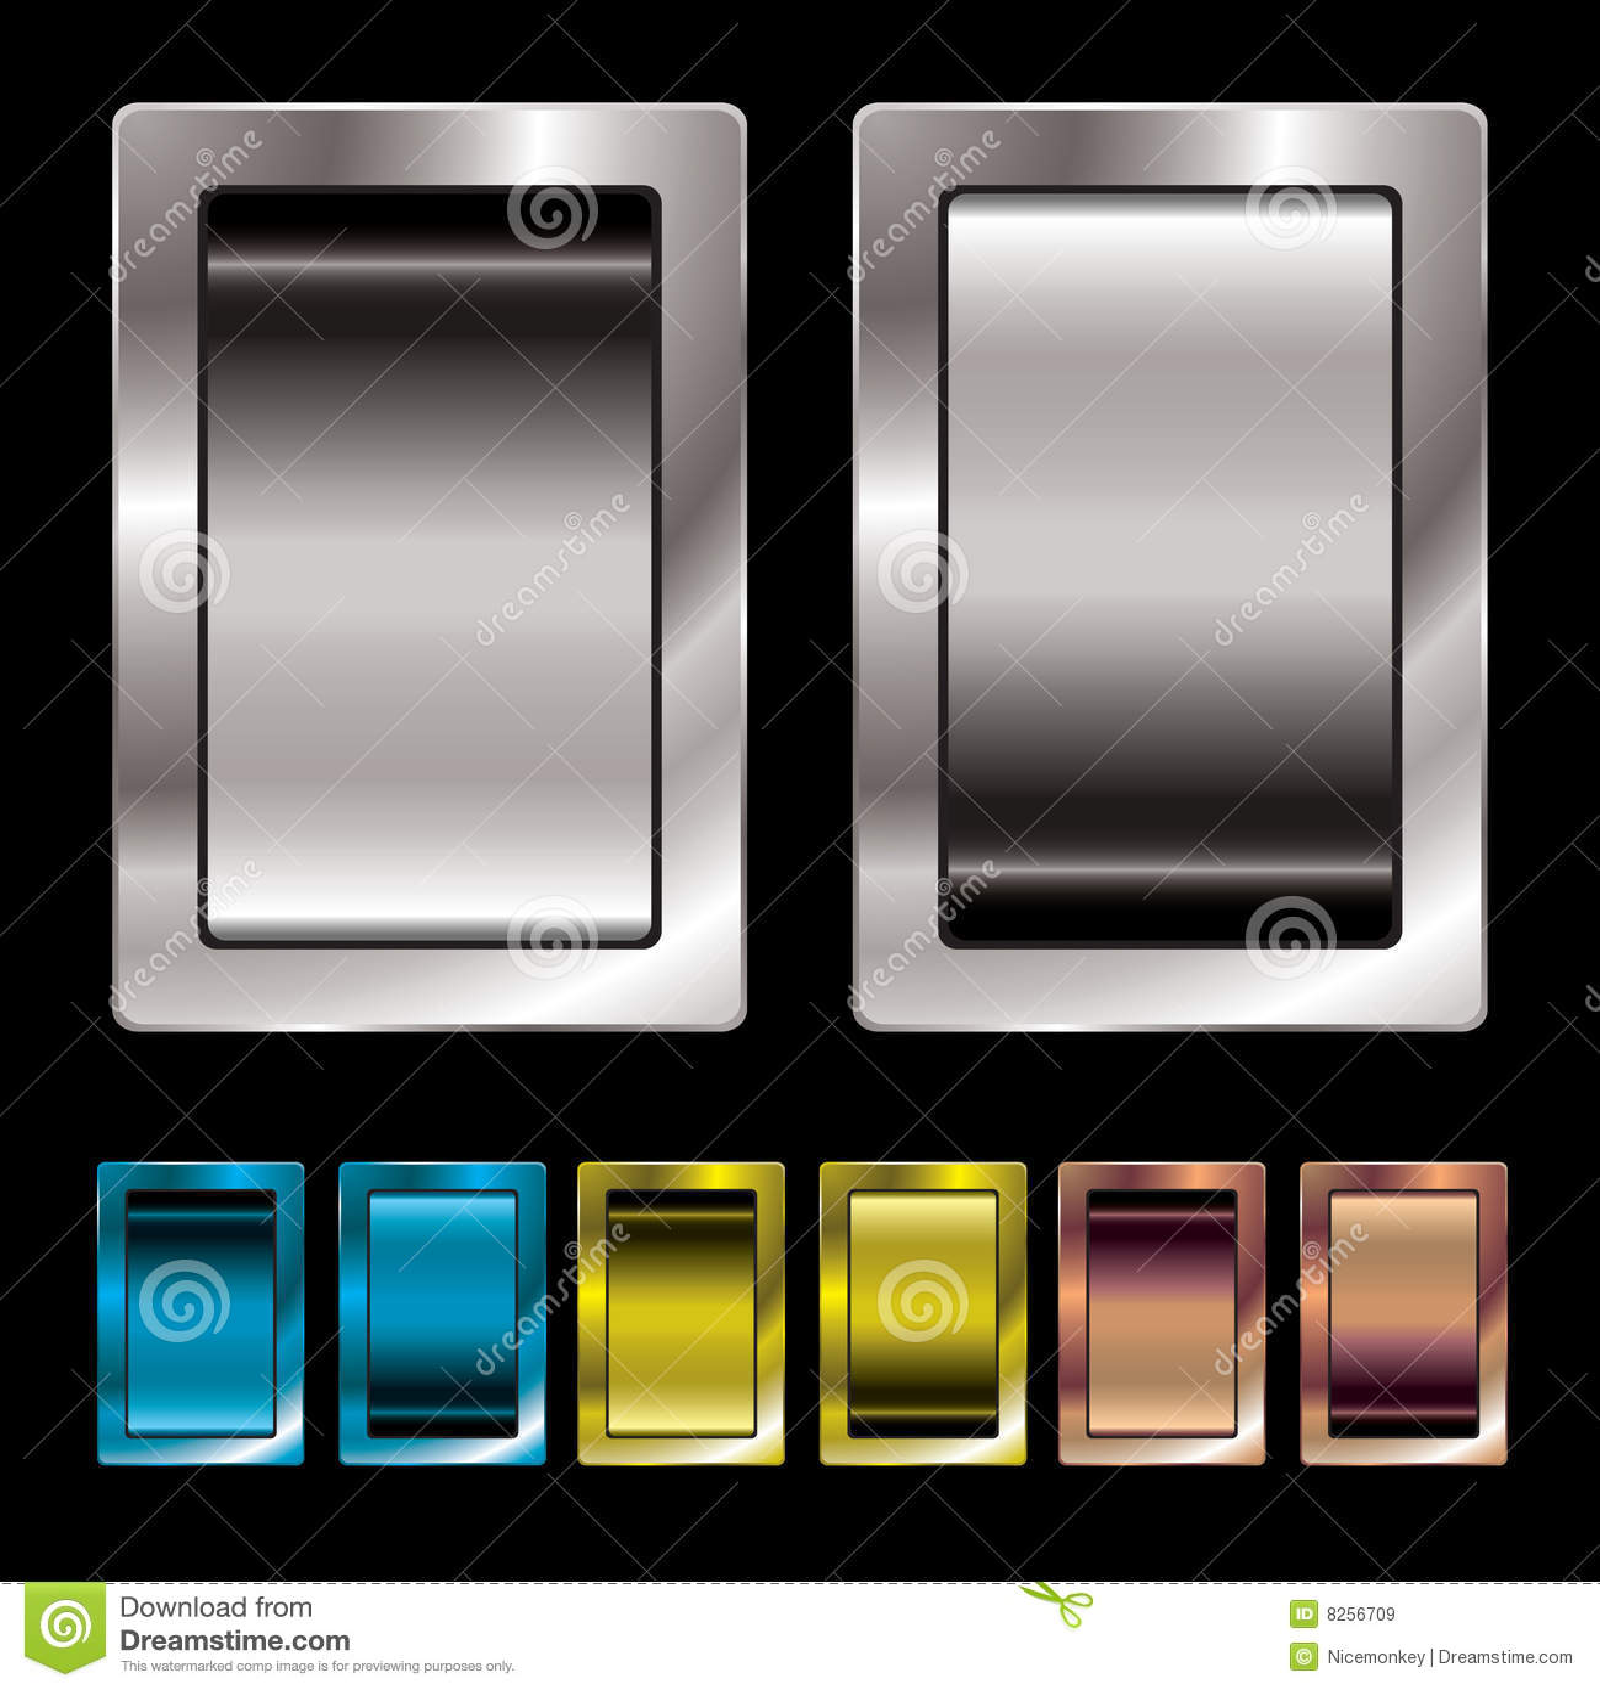 Switch variation